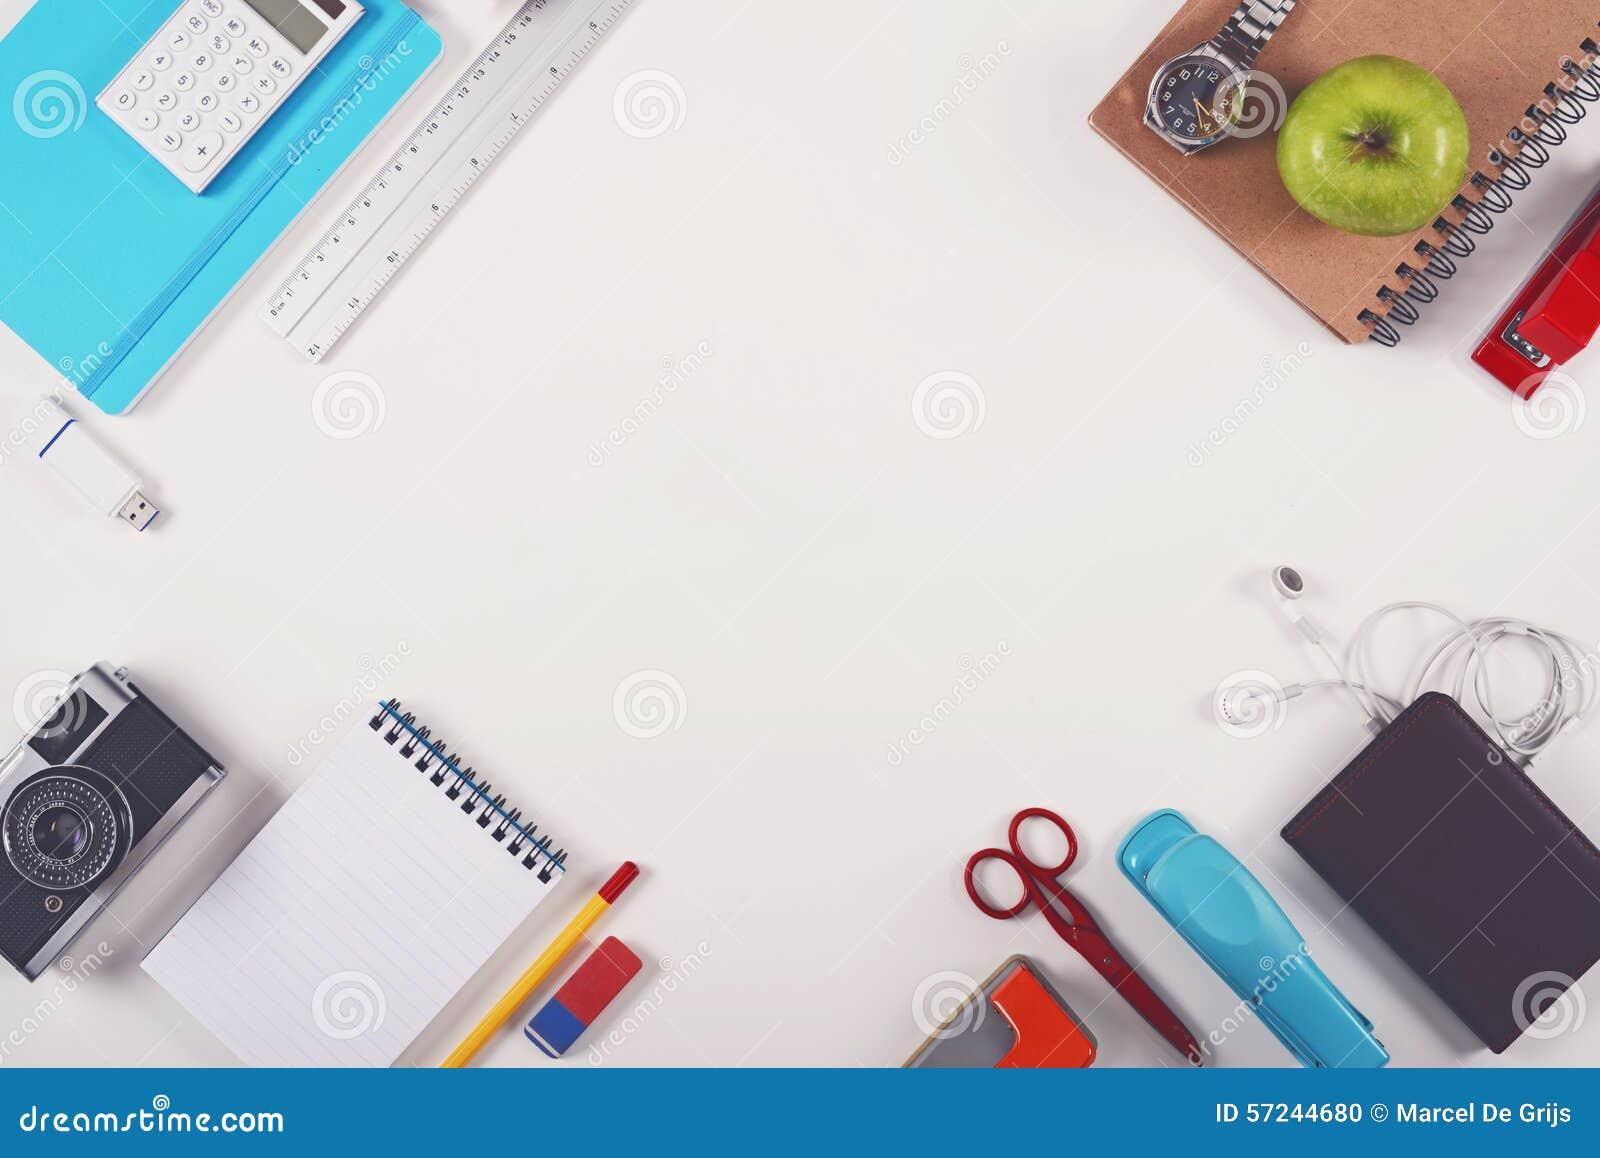 school clip art header - photo #37